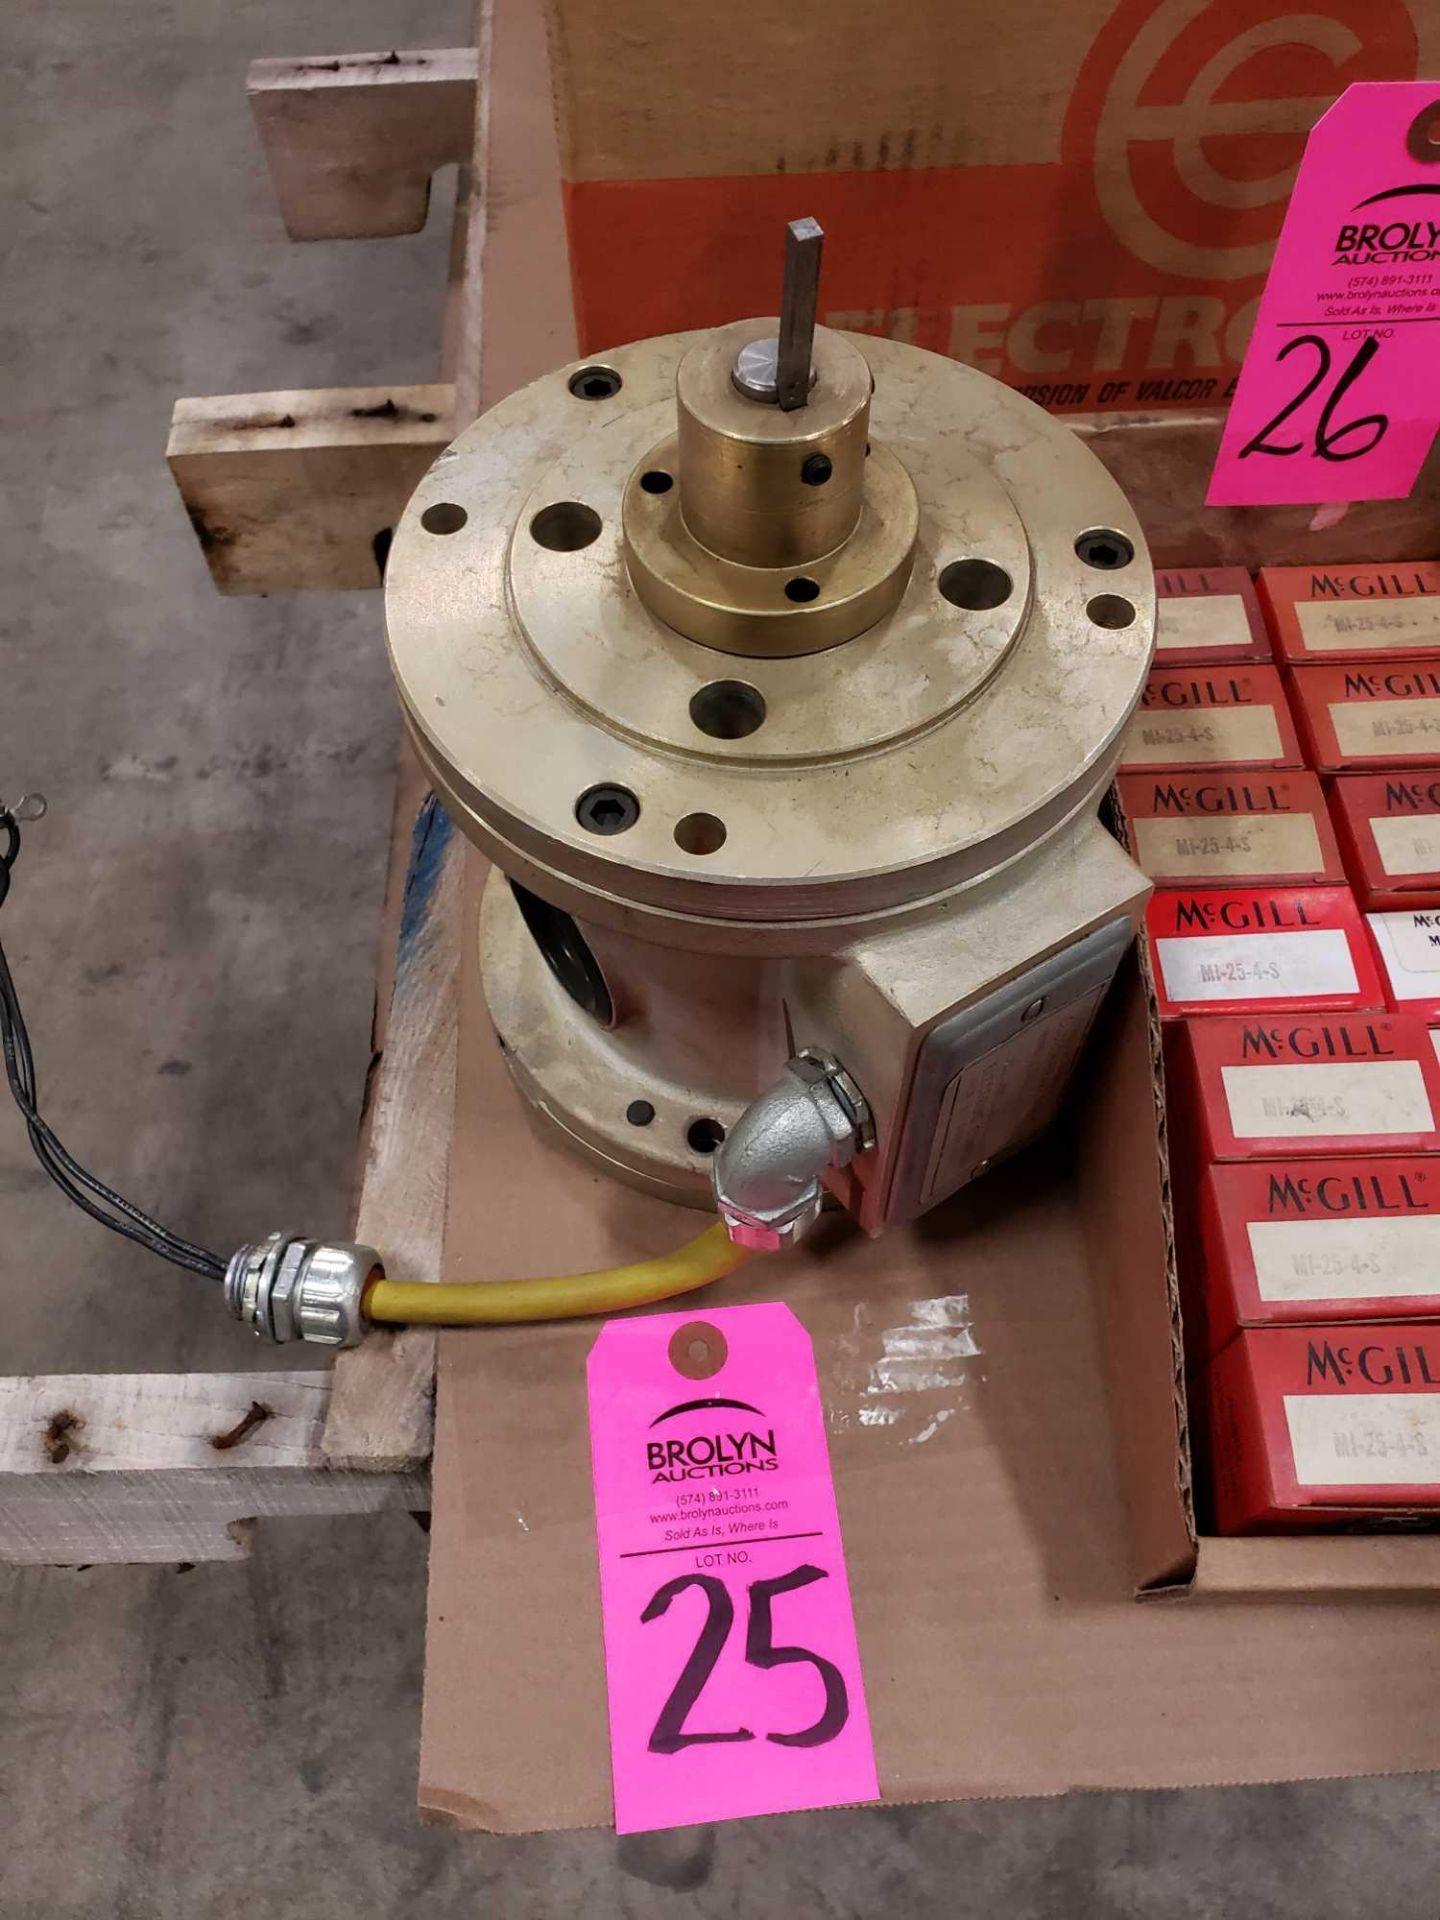 Lot 25 - Electroid electric clutch brake model CCF, part number CCF-42B-10-10.